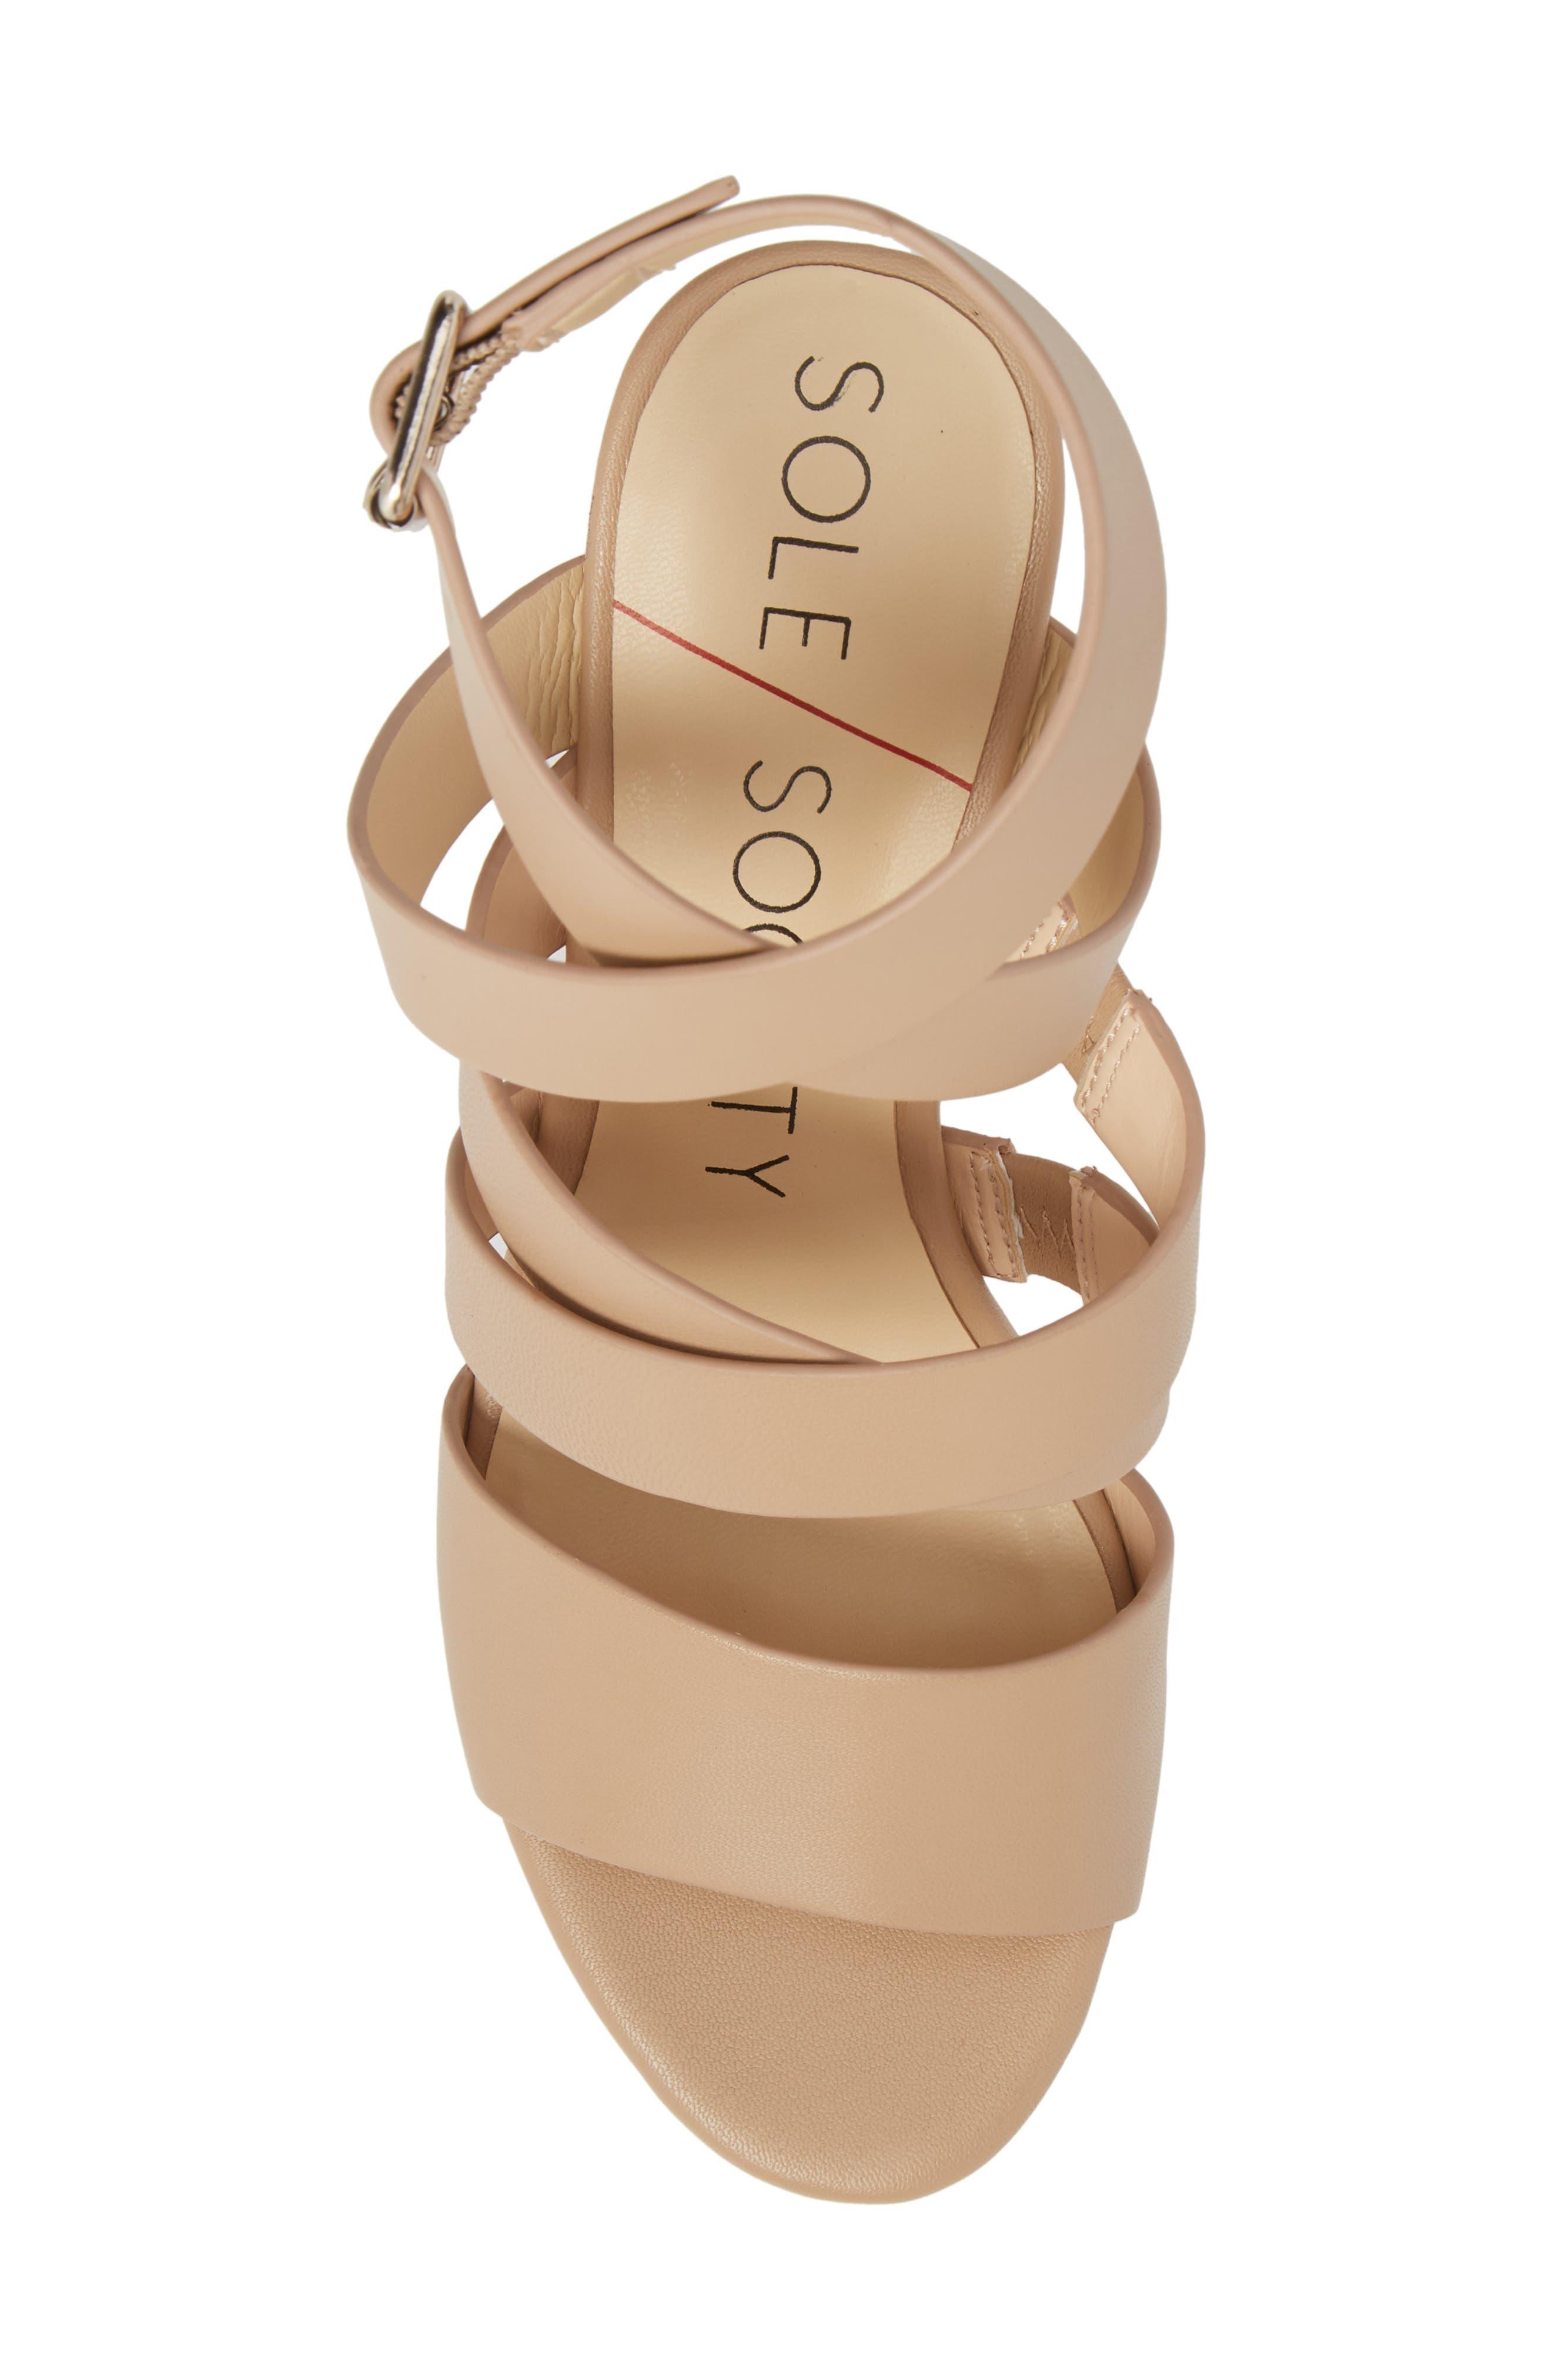 Pippy Platform Sandal,                             Alternate thumbnail 5, color,                             Tan